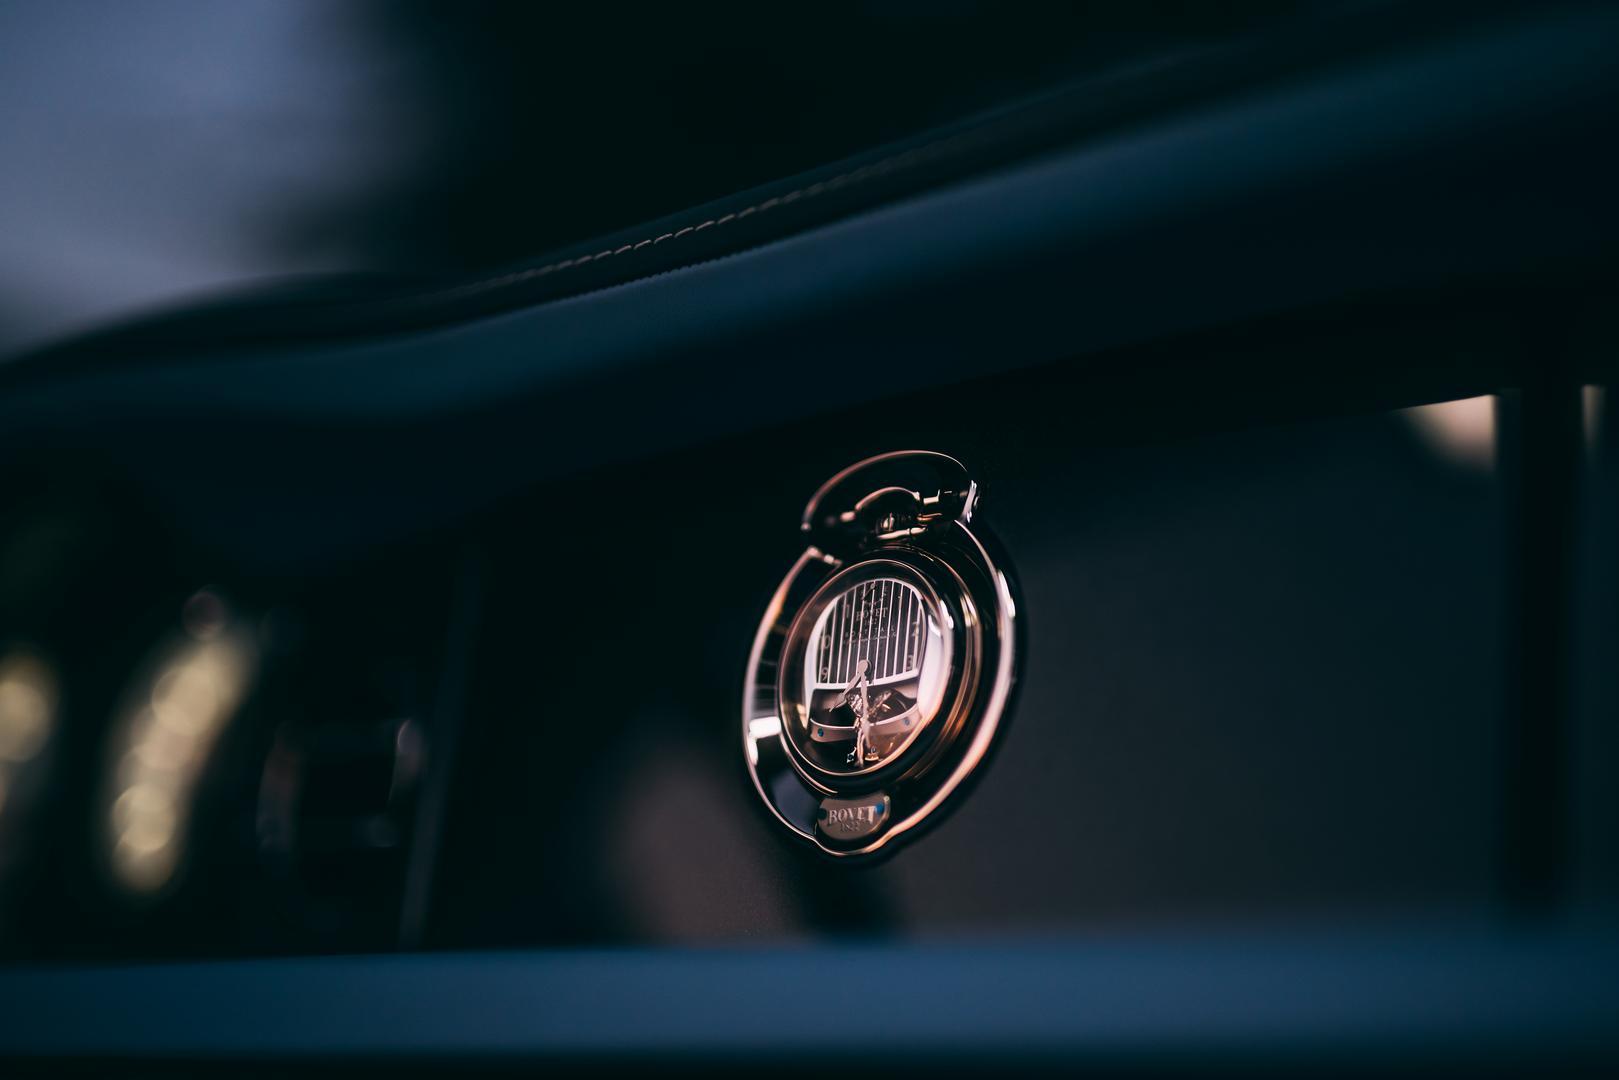 Rolls-Royce Boat Tail details